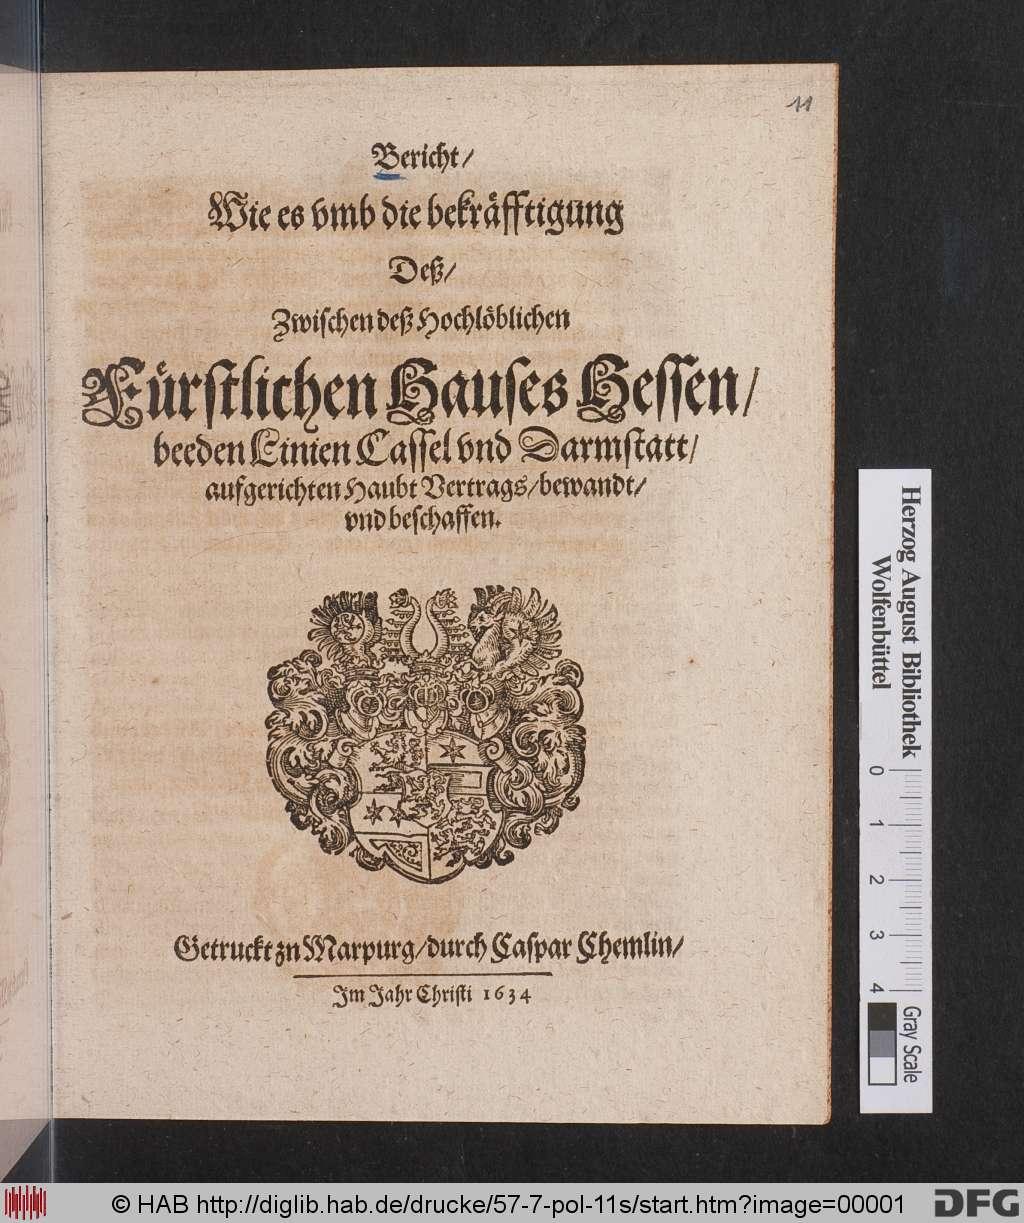 http://diglib.hab.de/drucke/57-7-pol-11s/00001.jpg